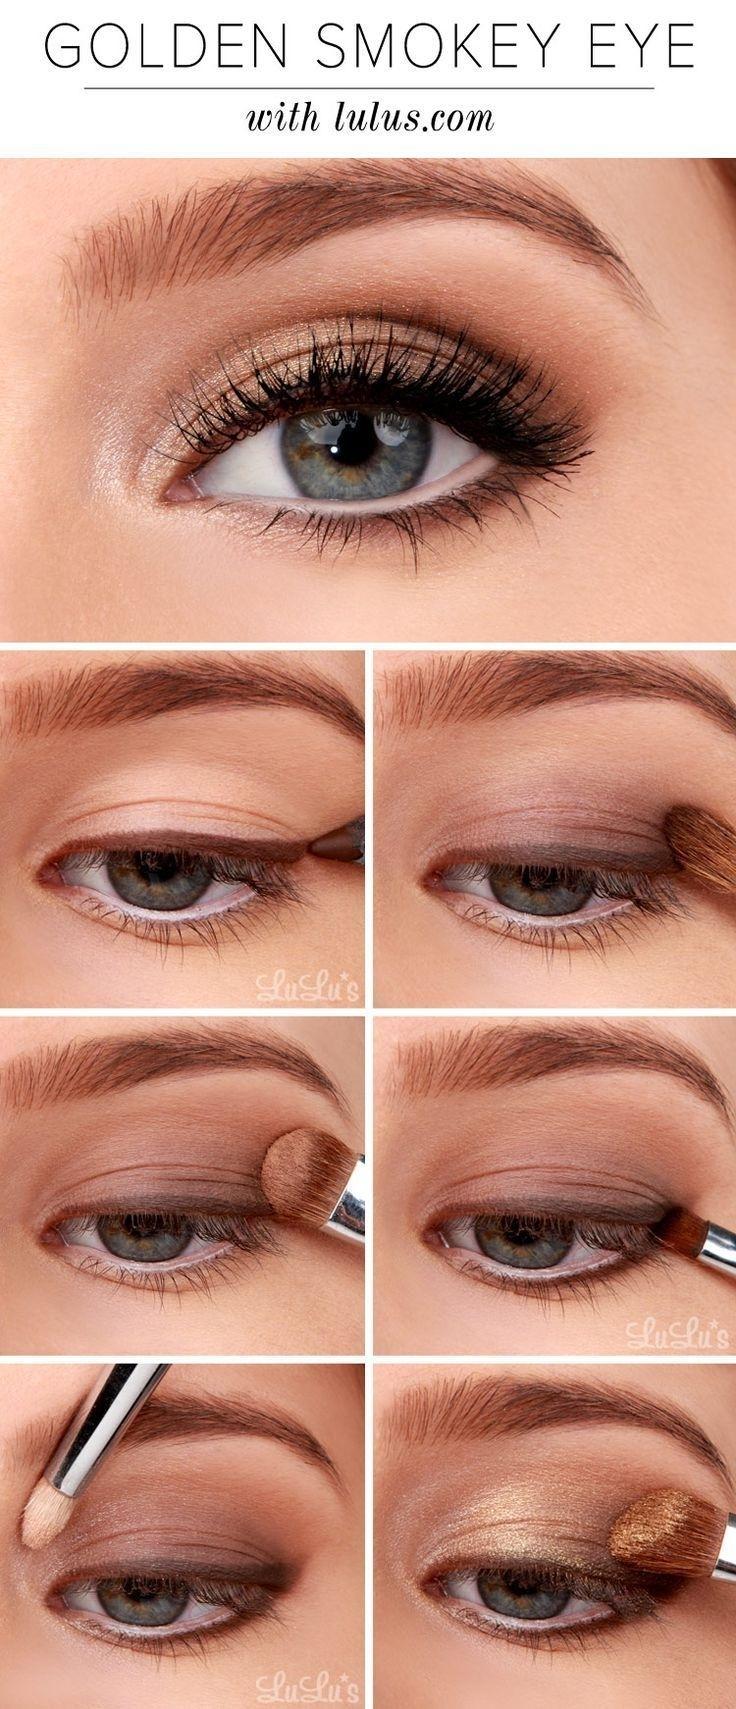 Golden Smokey Eye Makeup Tutorial Pictures, Photos, And Images For with regard to Smokey Eye Makeup Tumblr